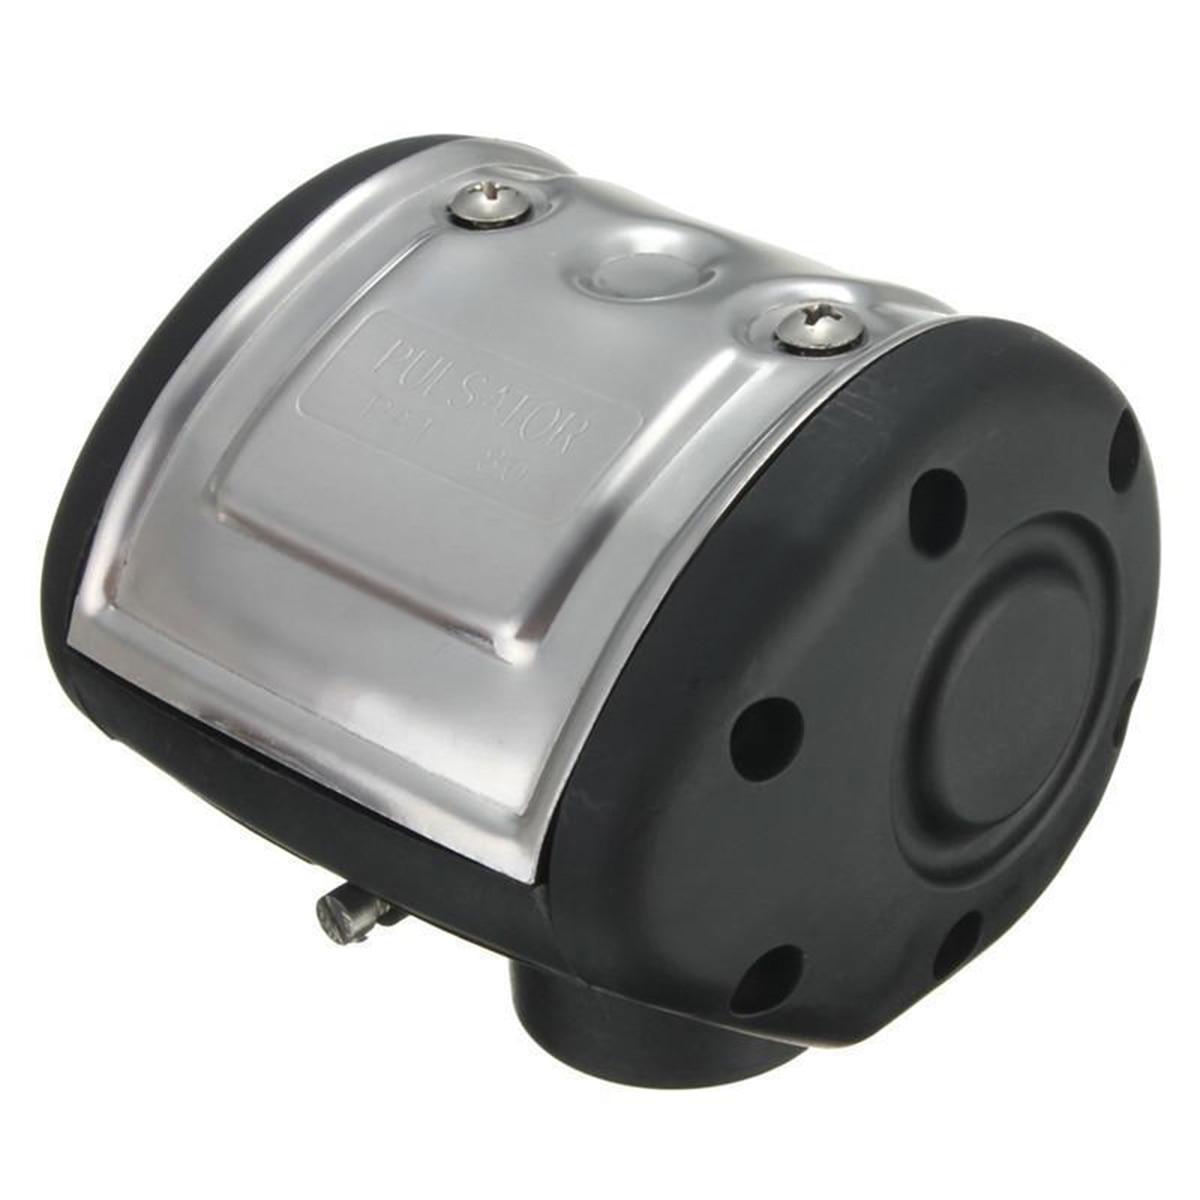 1pc L80 Pneumatic Pulsator Adjustable Black Milker Parts 86*82*110mm for Cow Milking Machine Dairy Farm Milker Mayitr washing machine parts wave plate pulsator board 325mm